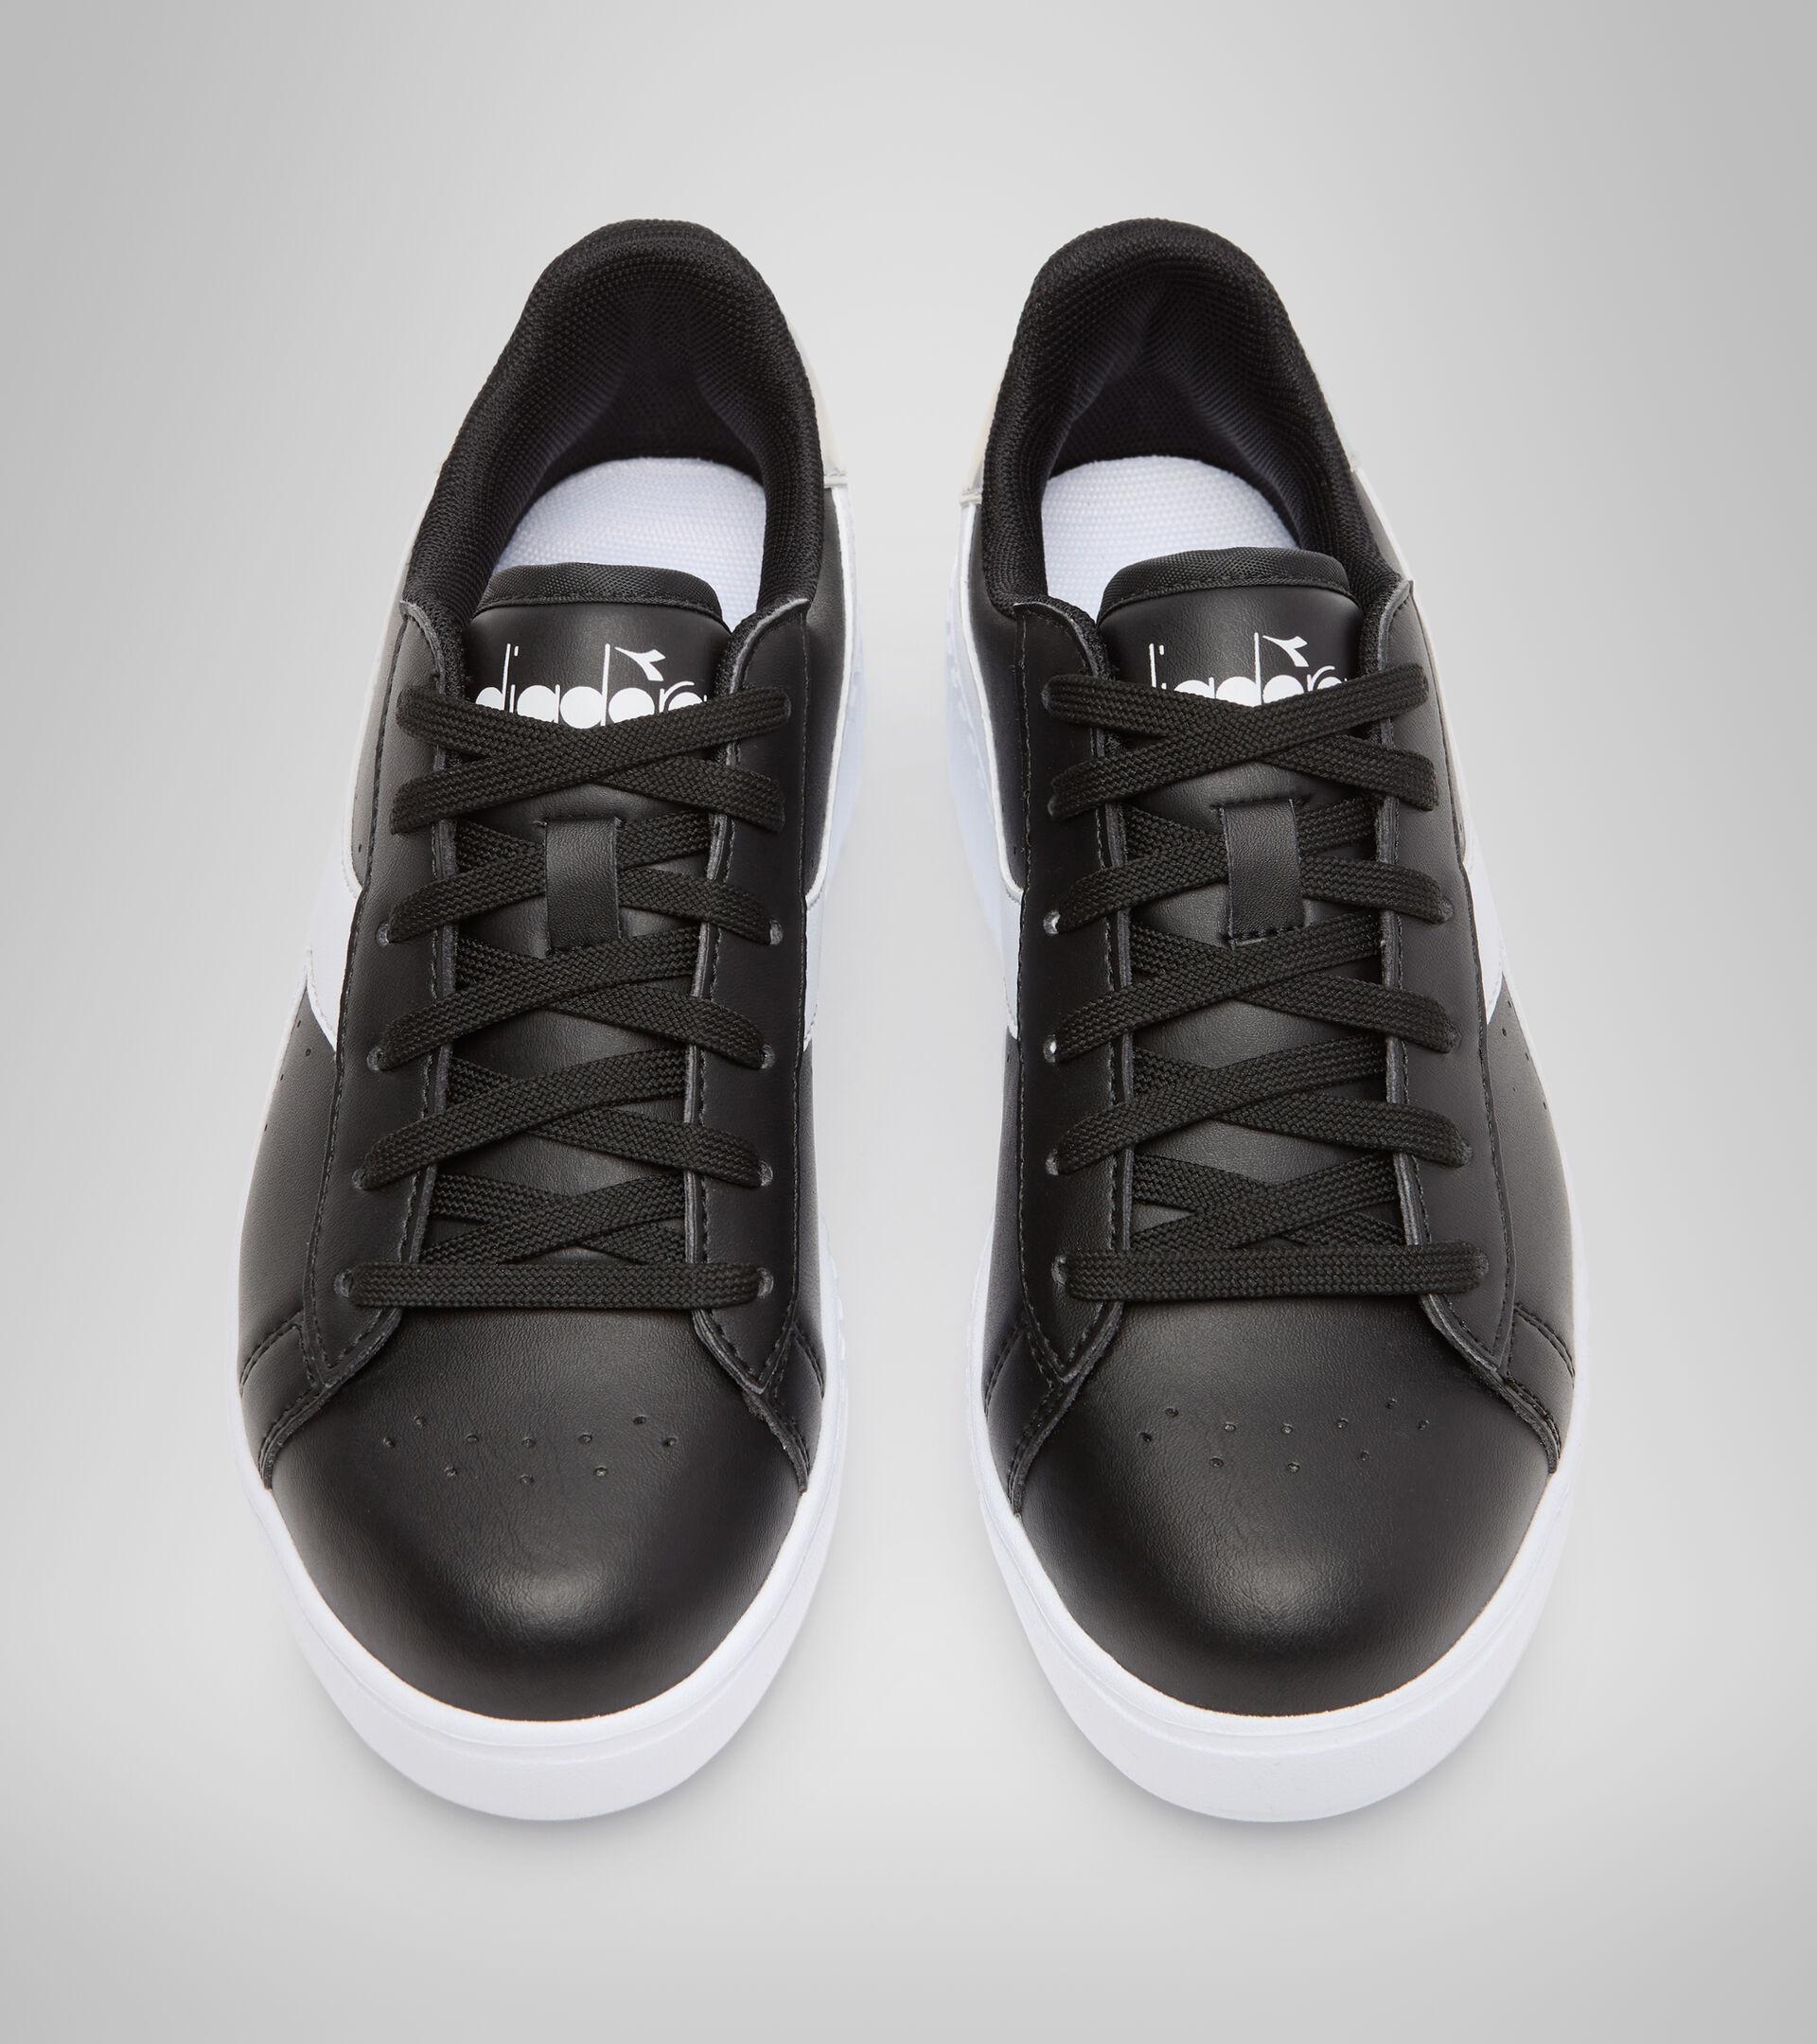 Chaussures de sport - Jeunes 8-16 ans GAME STEP GS NOIR/BLANC - Diadora